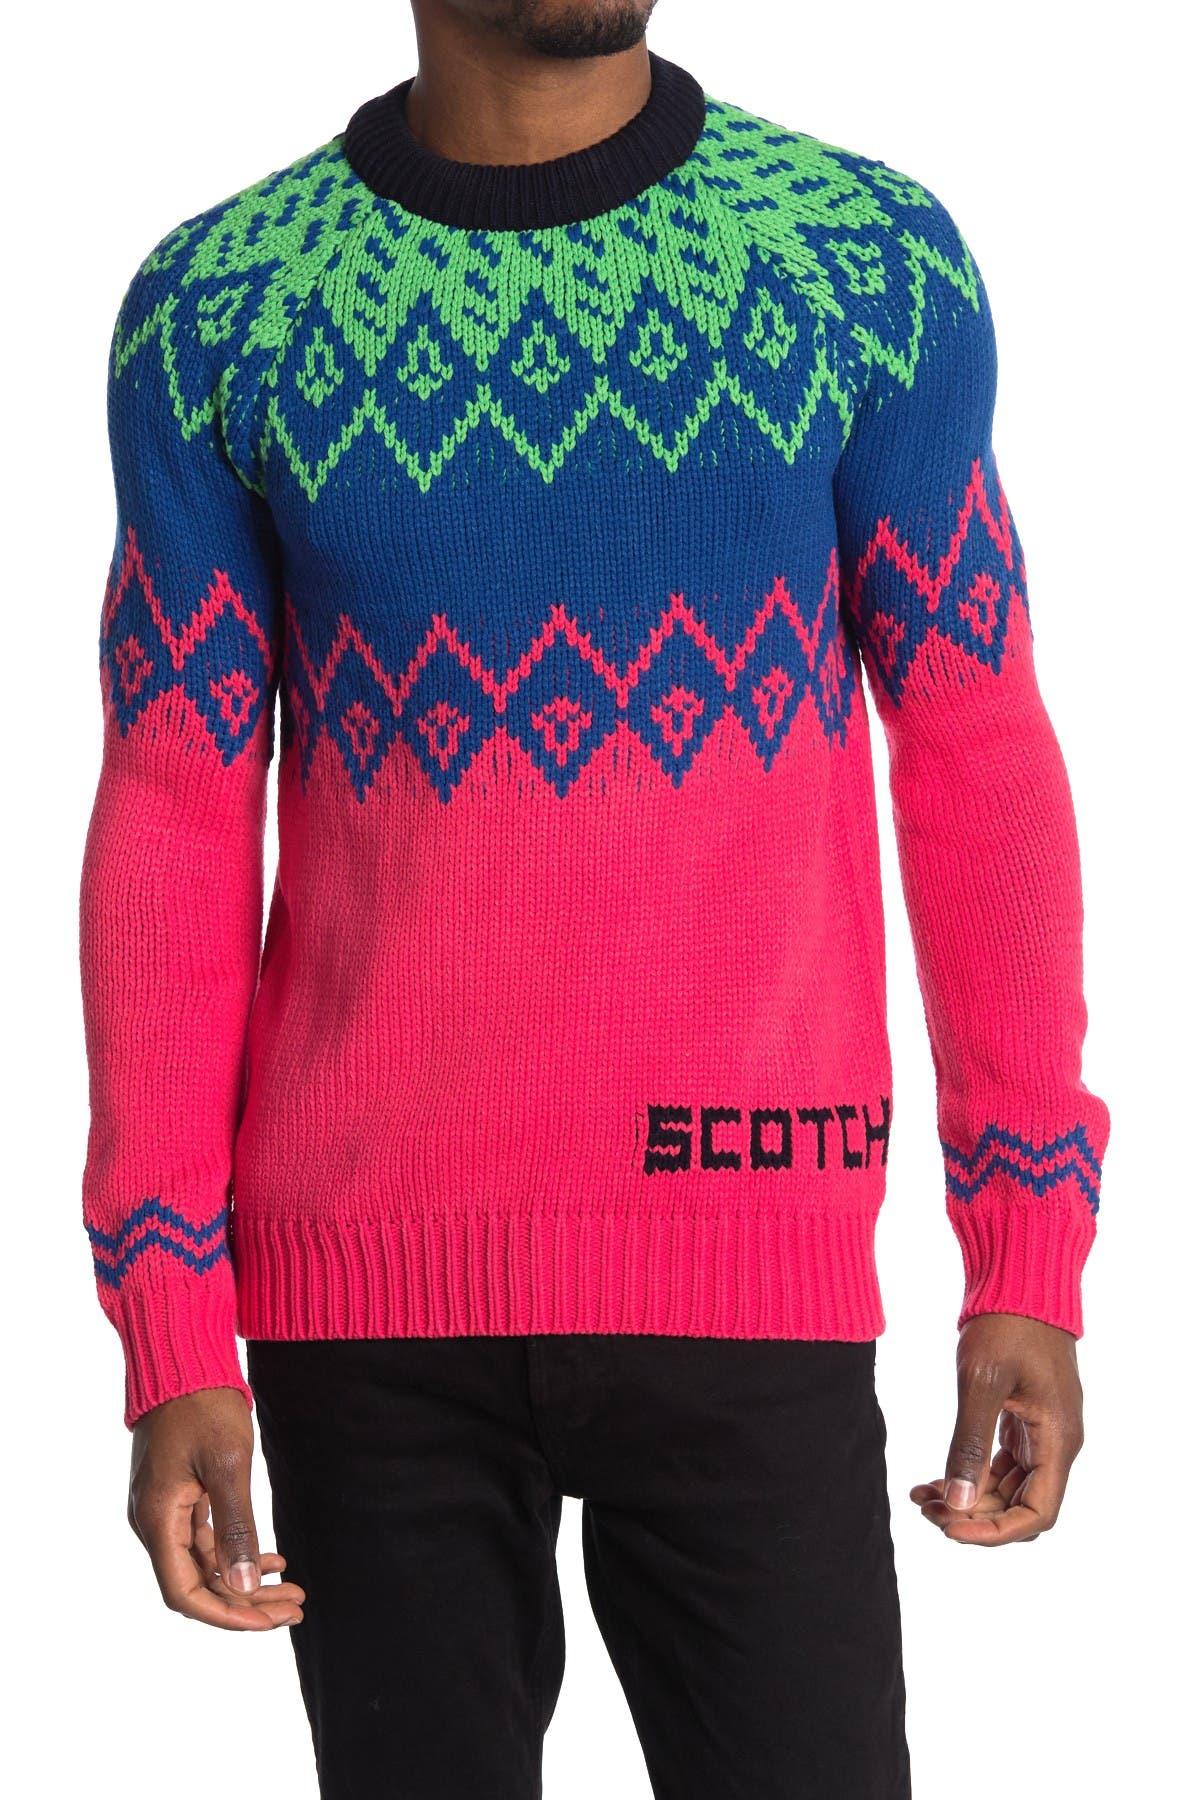 Image of Scotch & Soda Mixed Pattern Crew Neck Sweater